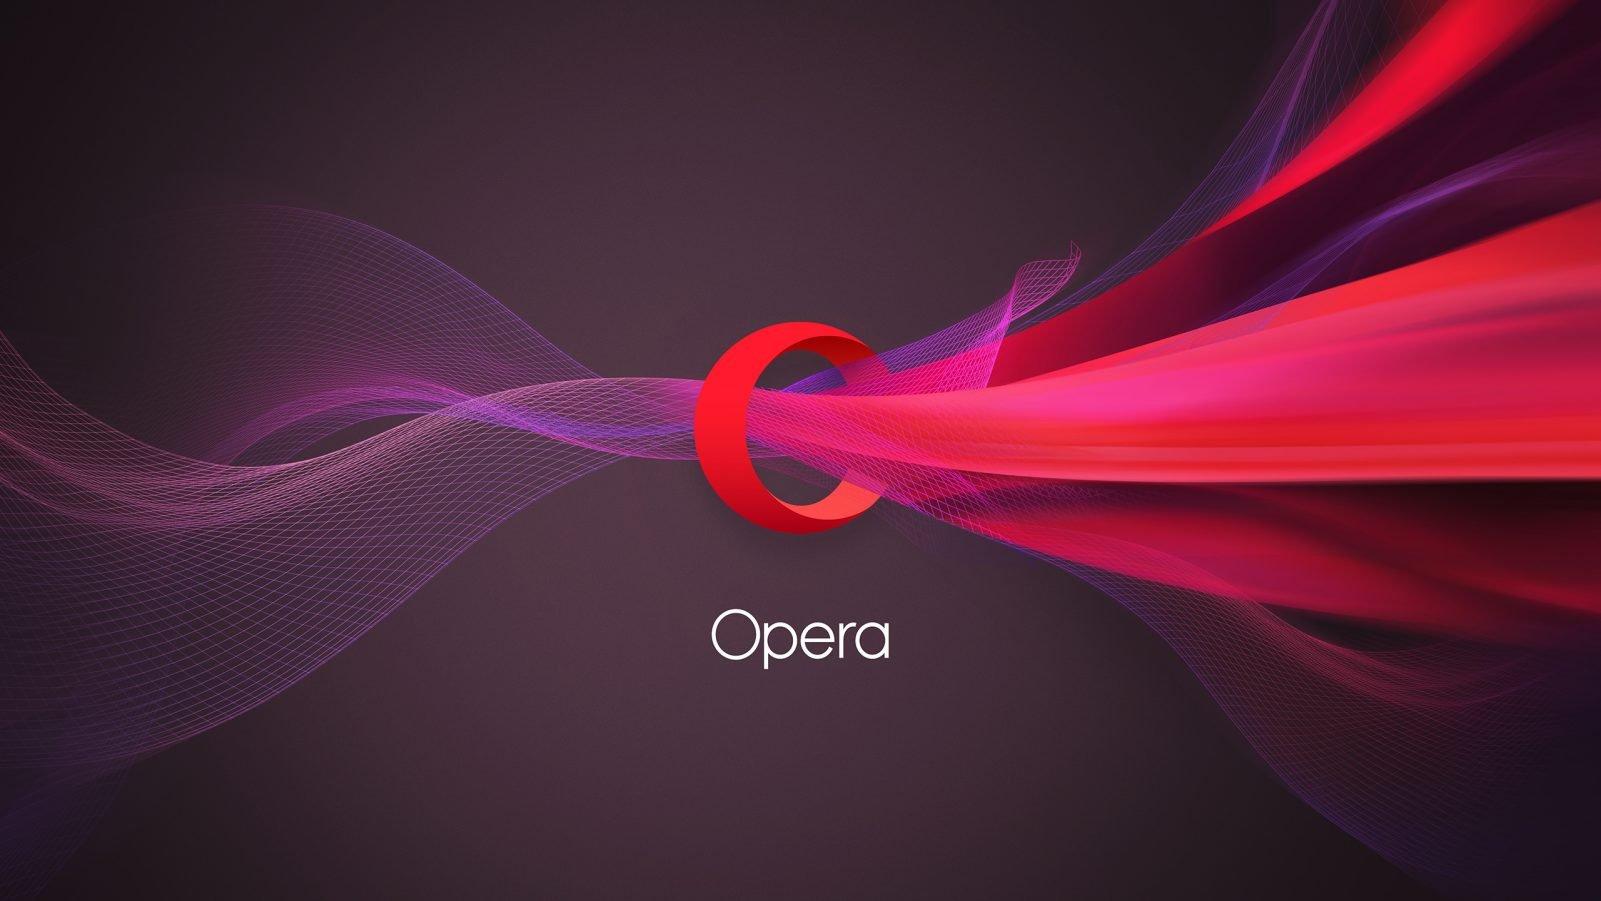 Opera переходит на движок WebKit